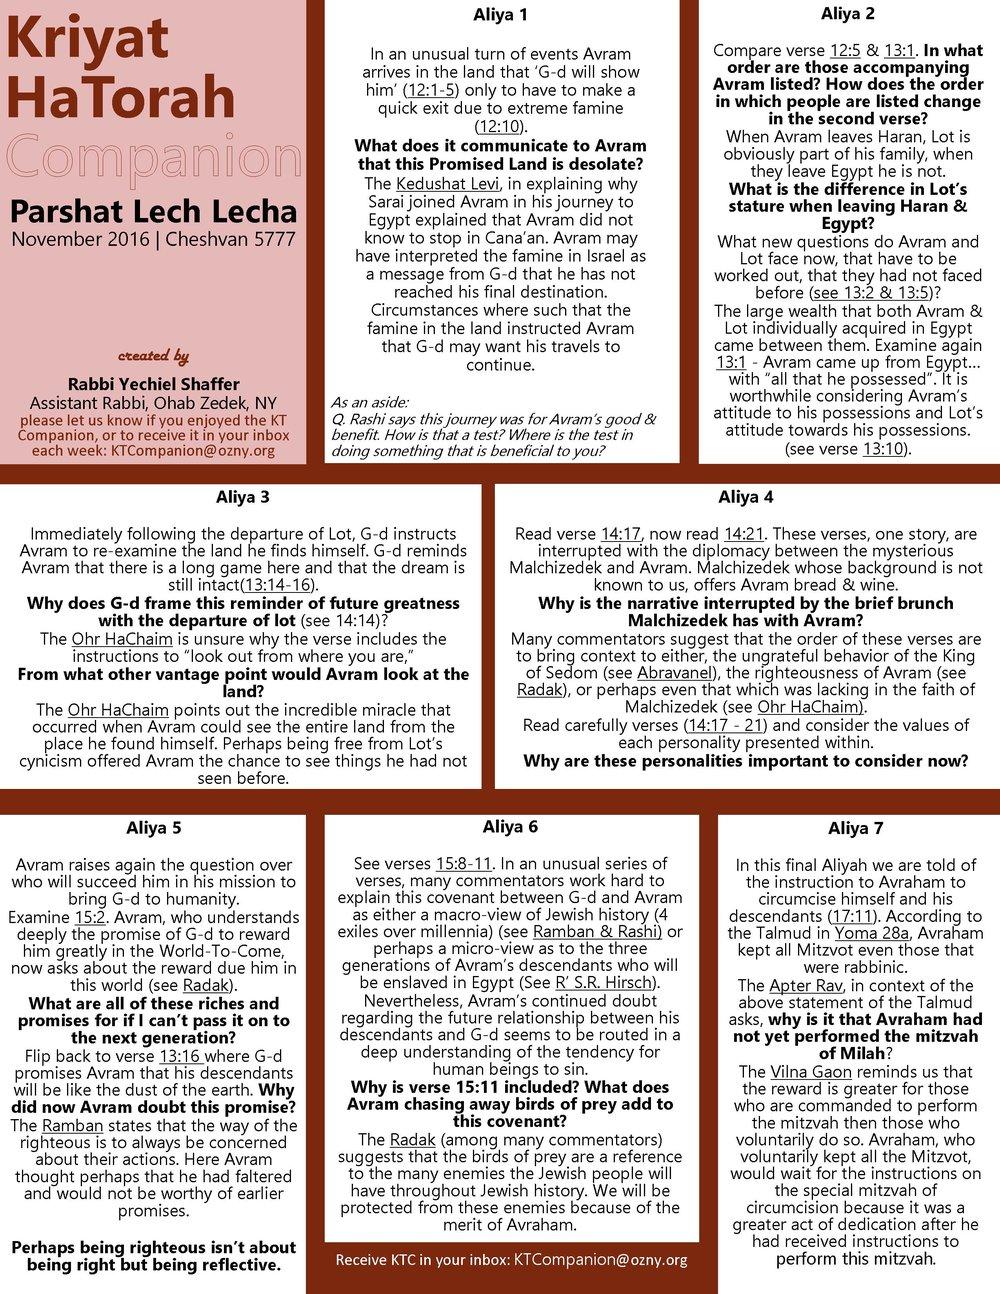 Click image for printable version of KTC Lech Lecha